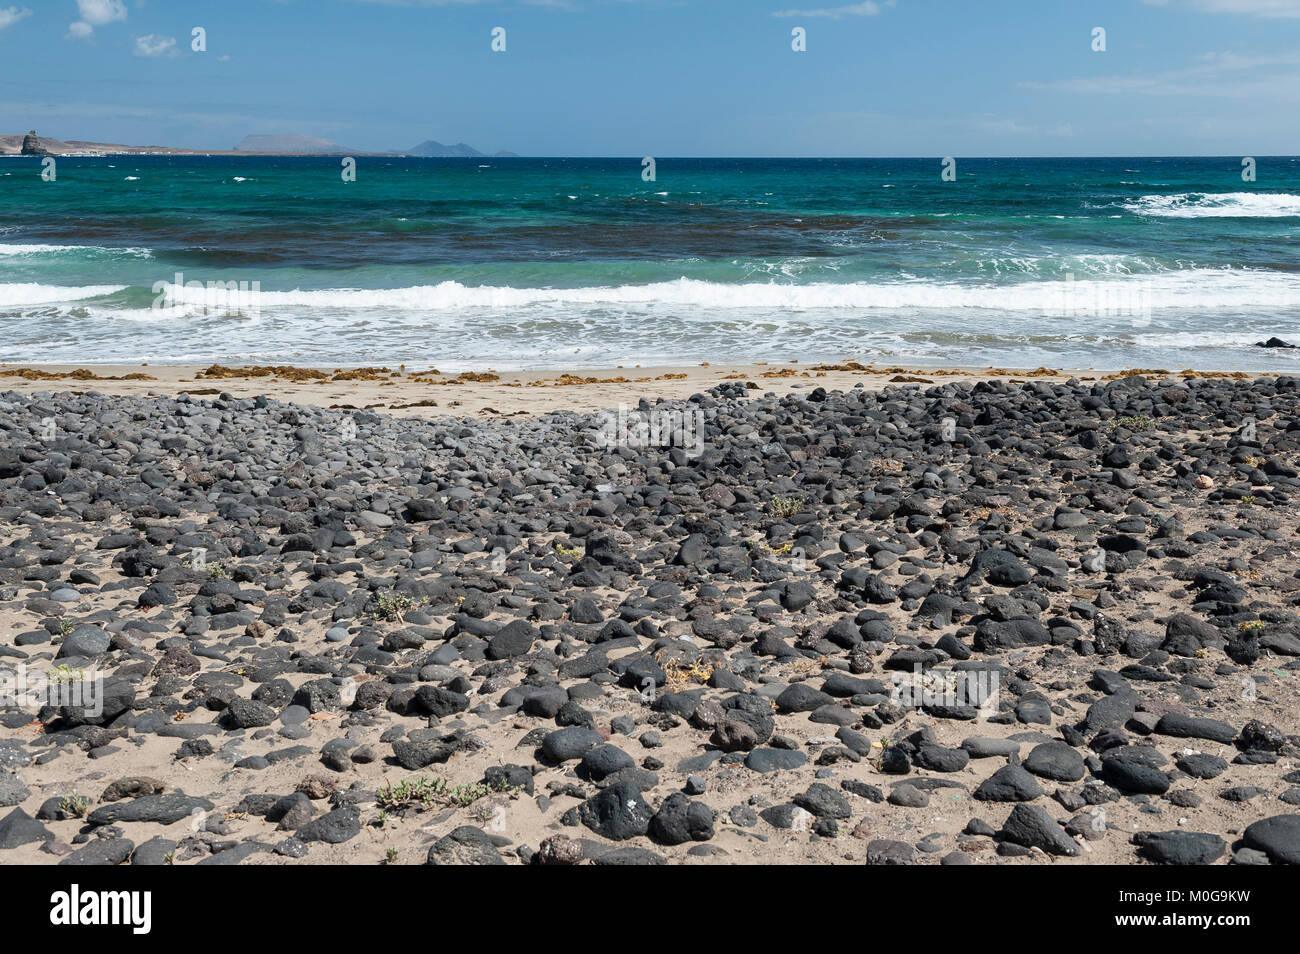 Playa de la Canteria, Orzola, municipio de Haría, Lanzarote, Islas Canarias, España Imagen De Stock